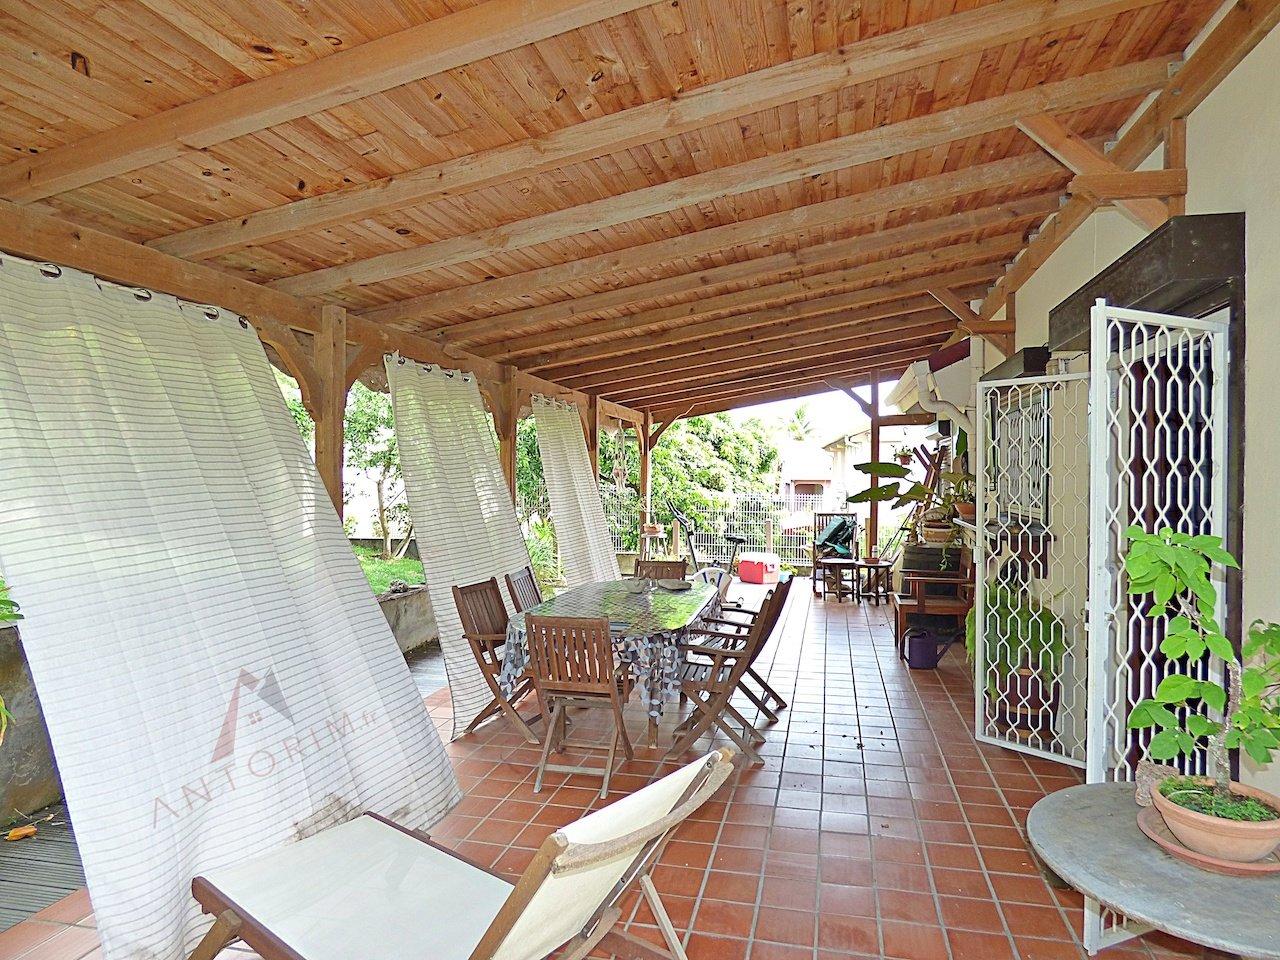 EXCLUSIVITE - SCHOELCHER - Terreville - Jolie Villa T4 au Calme